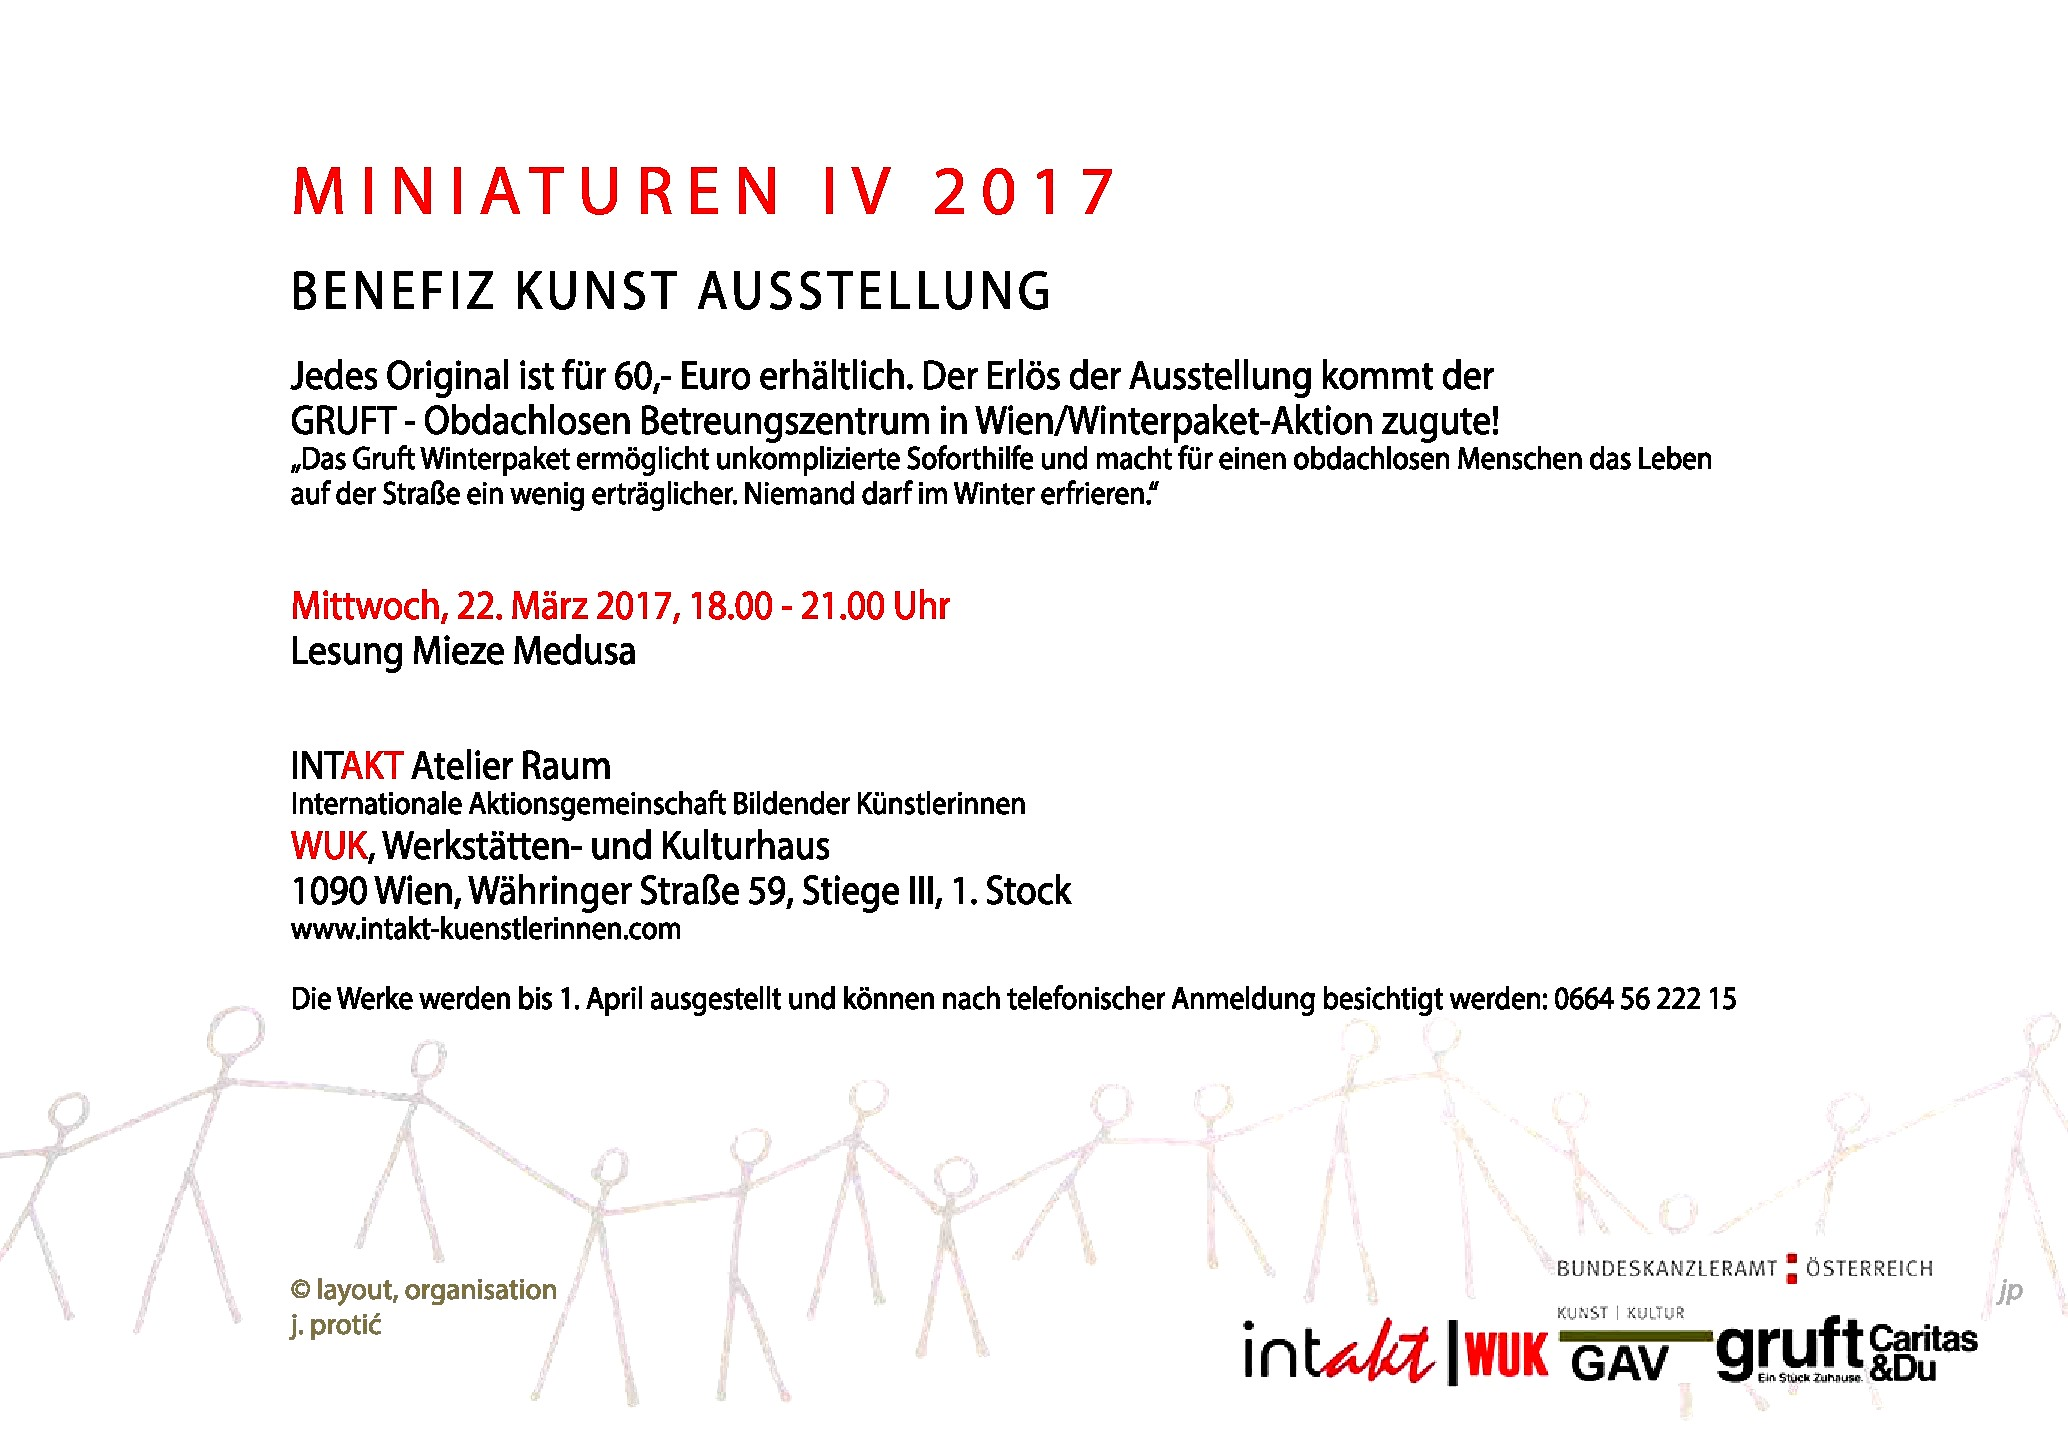 MINIATUREN IV 2017 – Benefiz Kunst Ausstellung